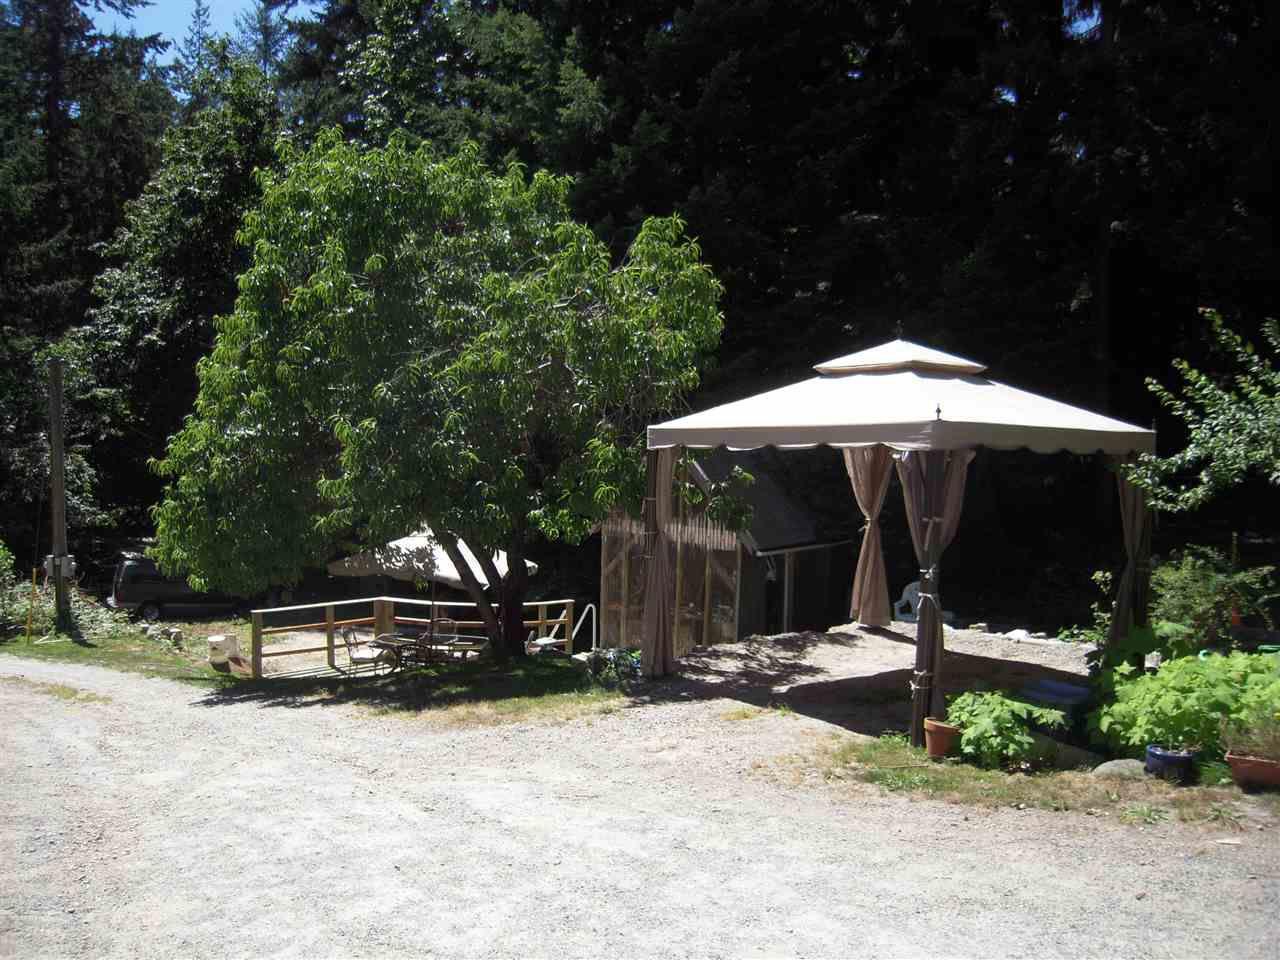 Photo 4: Photos: 2670 LOWER Road: Roberts Creek House for sale (Sunshine Coast)  : MLS®# R2096275